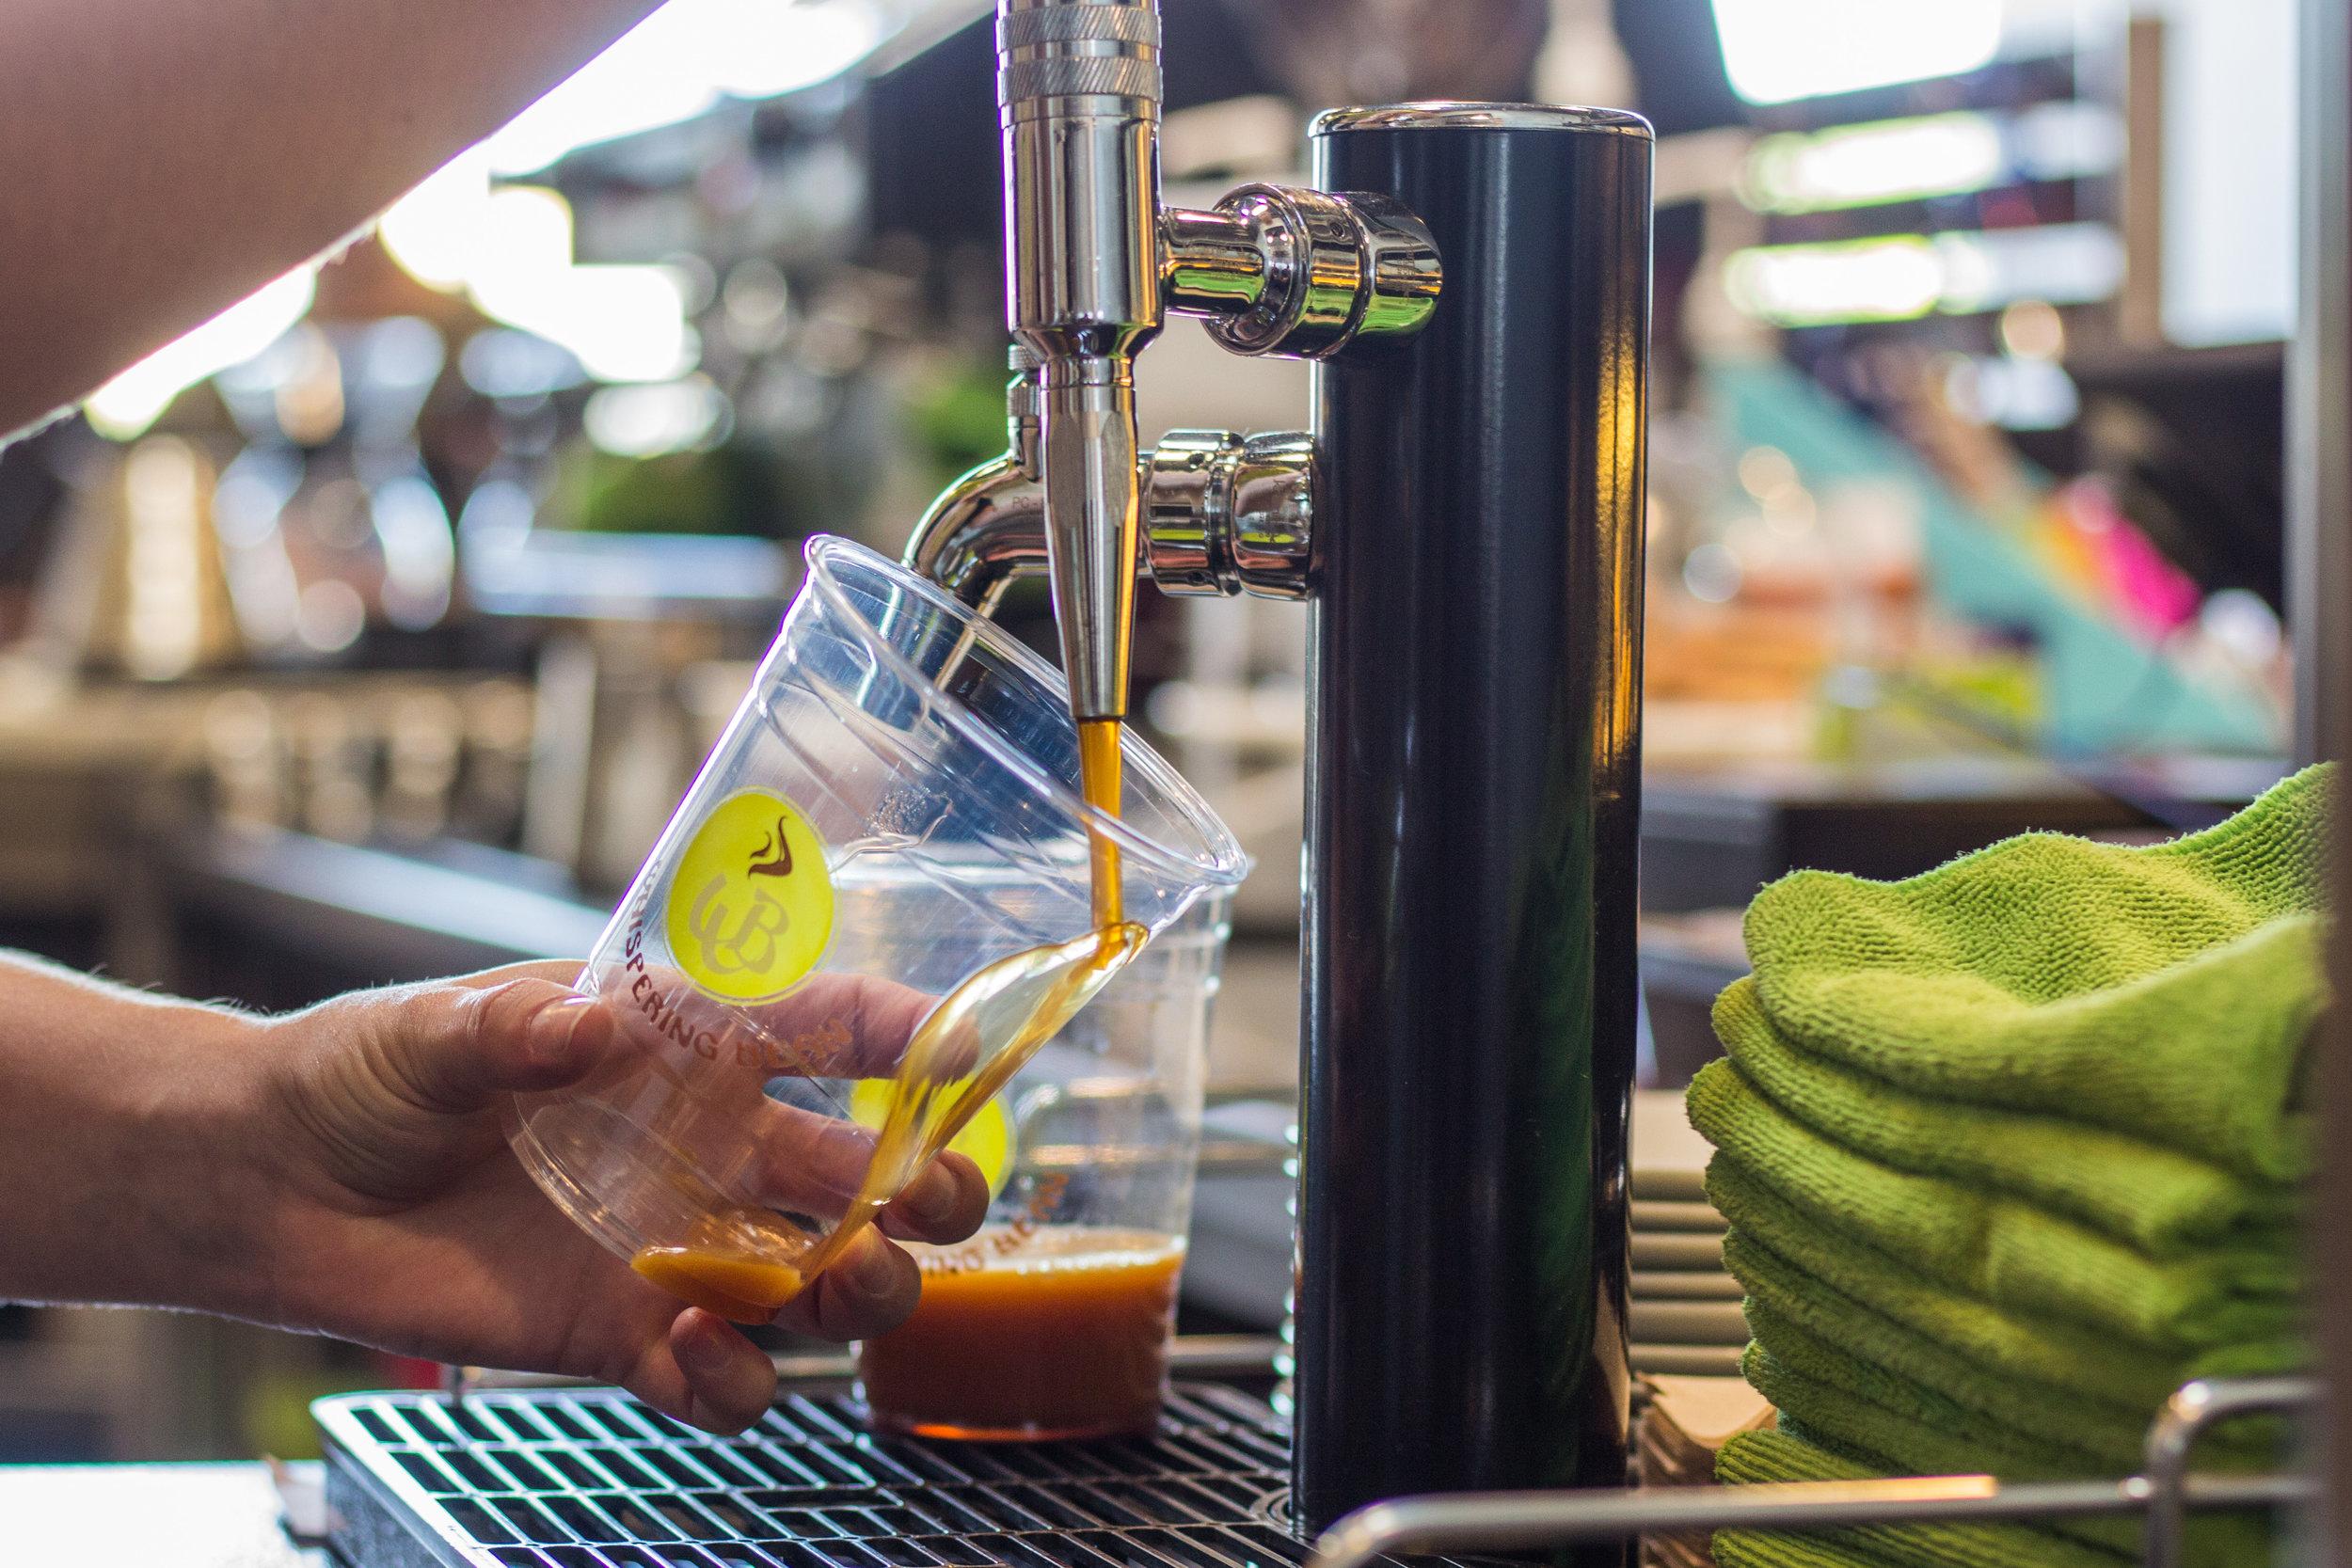 Nitro Brew at  Whispering Bean Coffee Roasters  - Albuquerque, NM